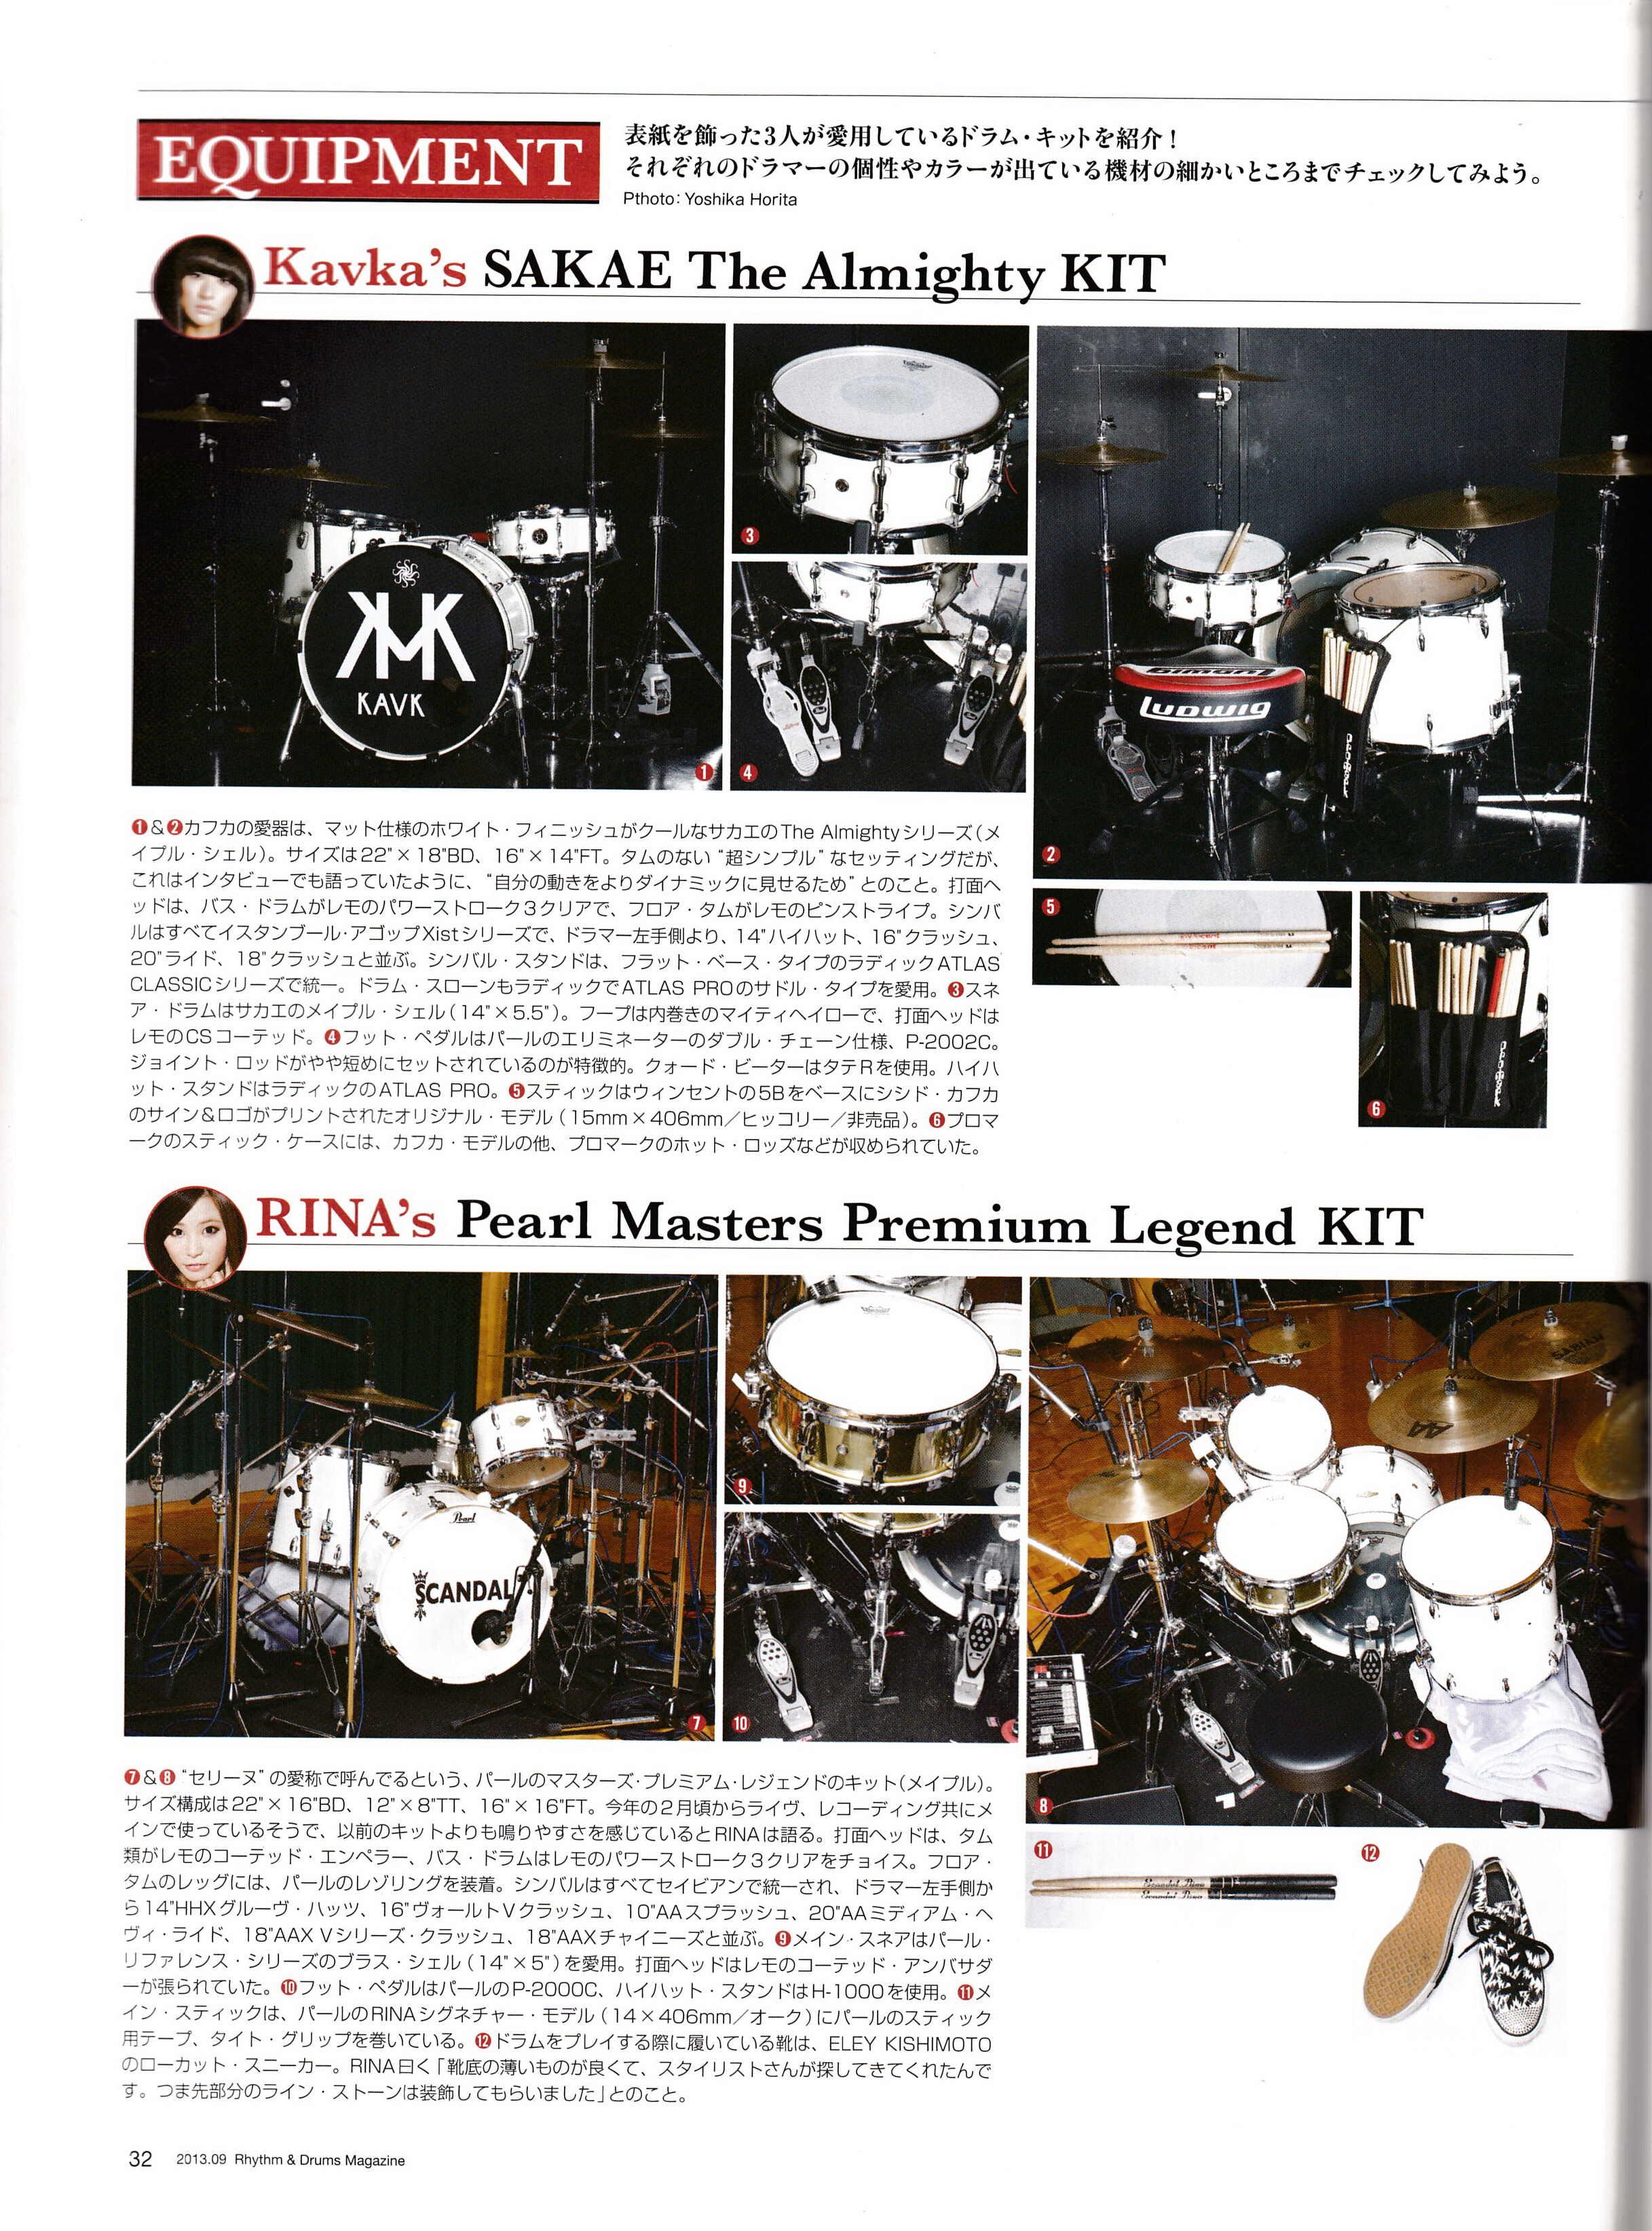 Rhythm & Drums Magazine Img_0097